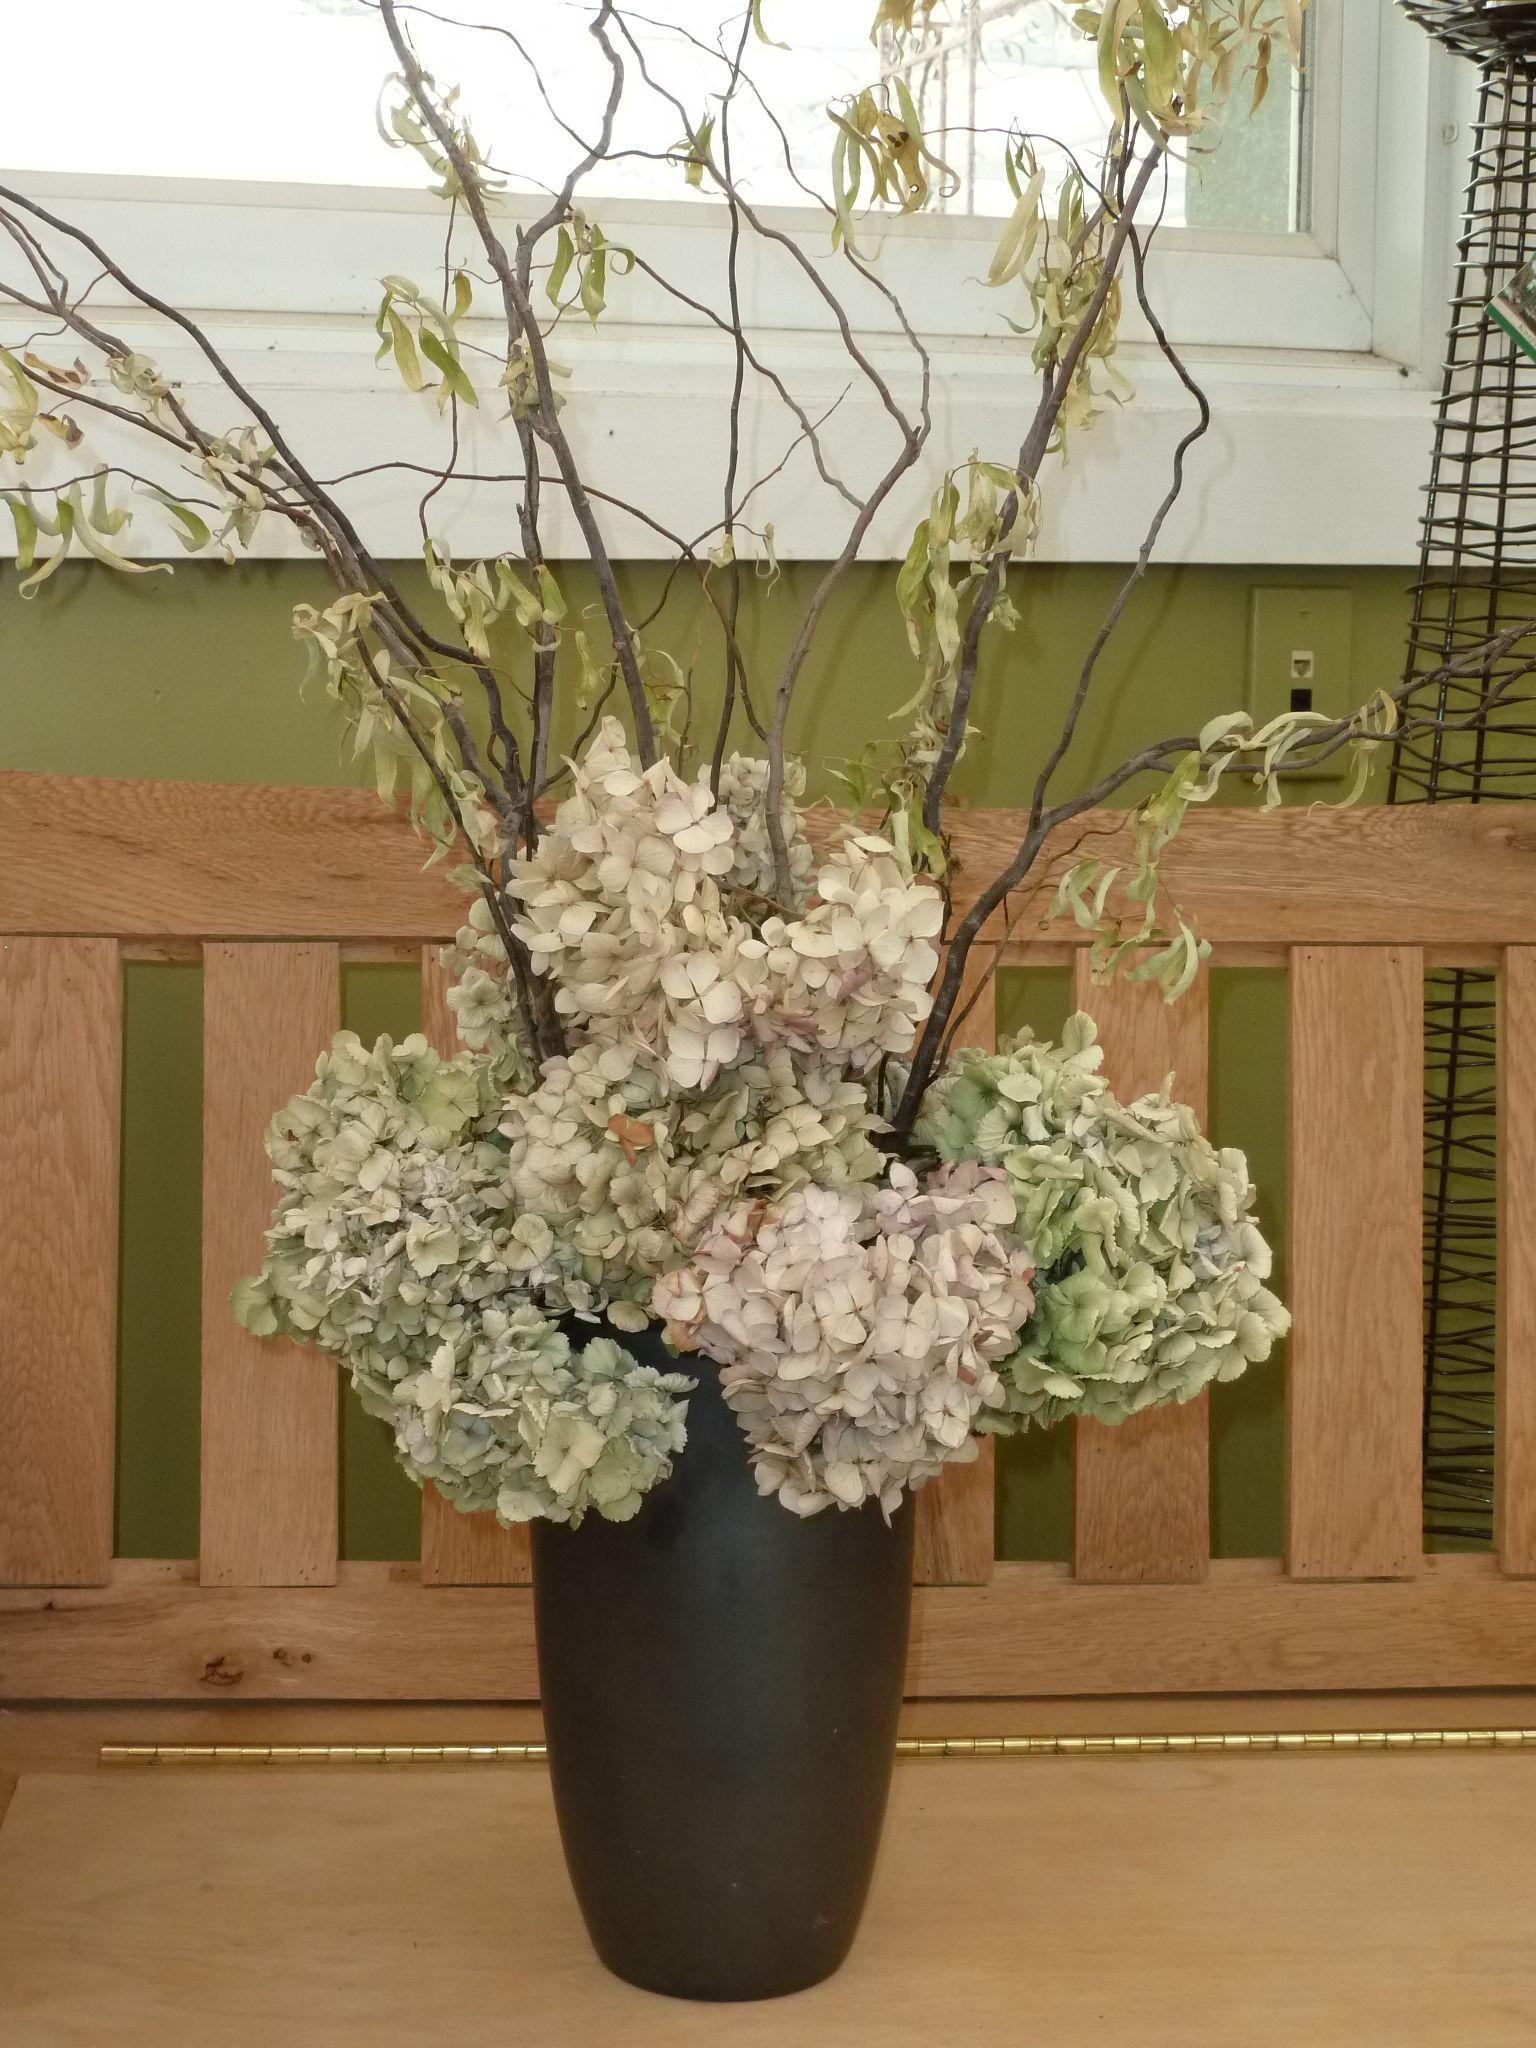 Top floral arrangements using hydrangeas best